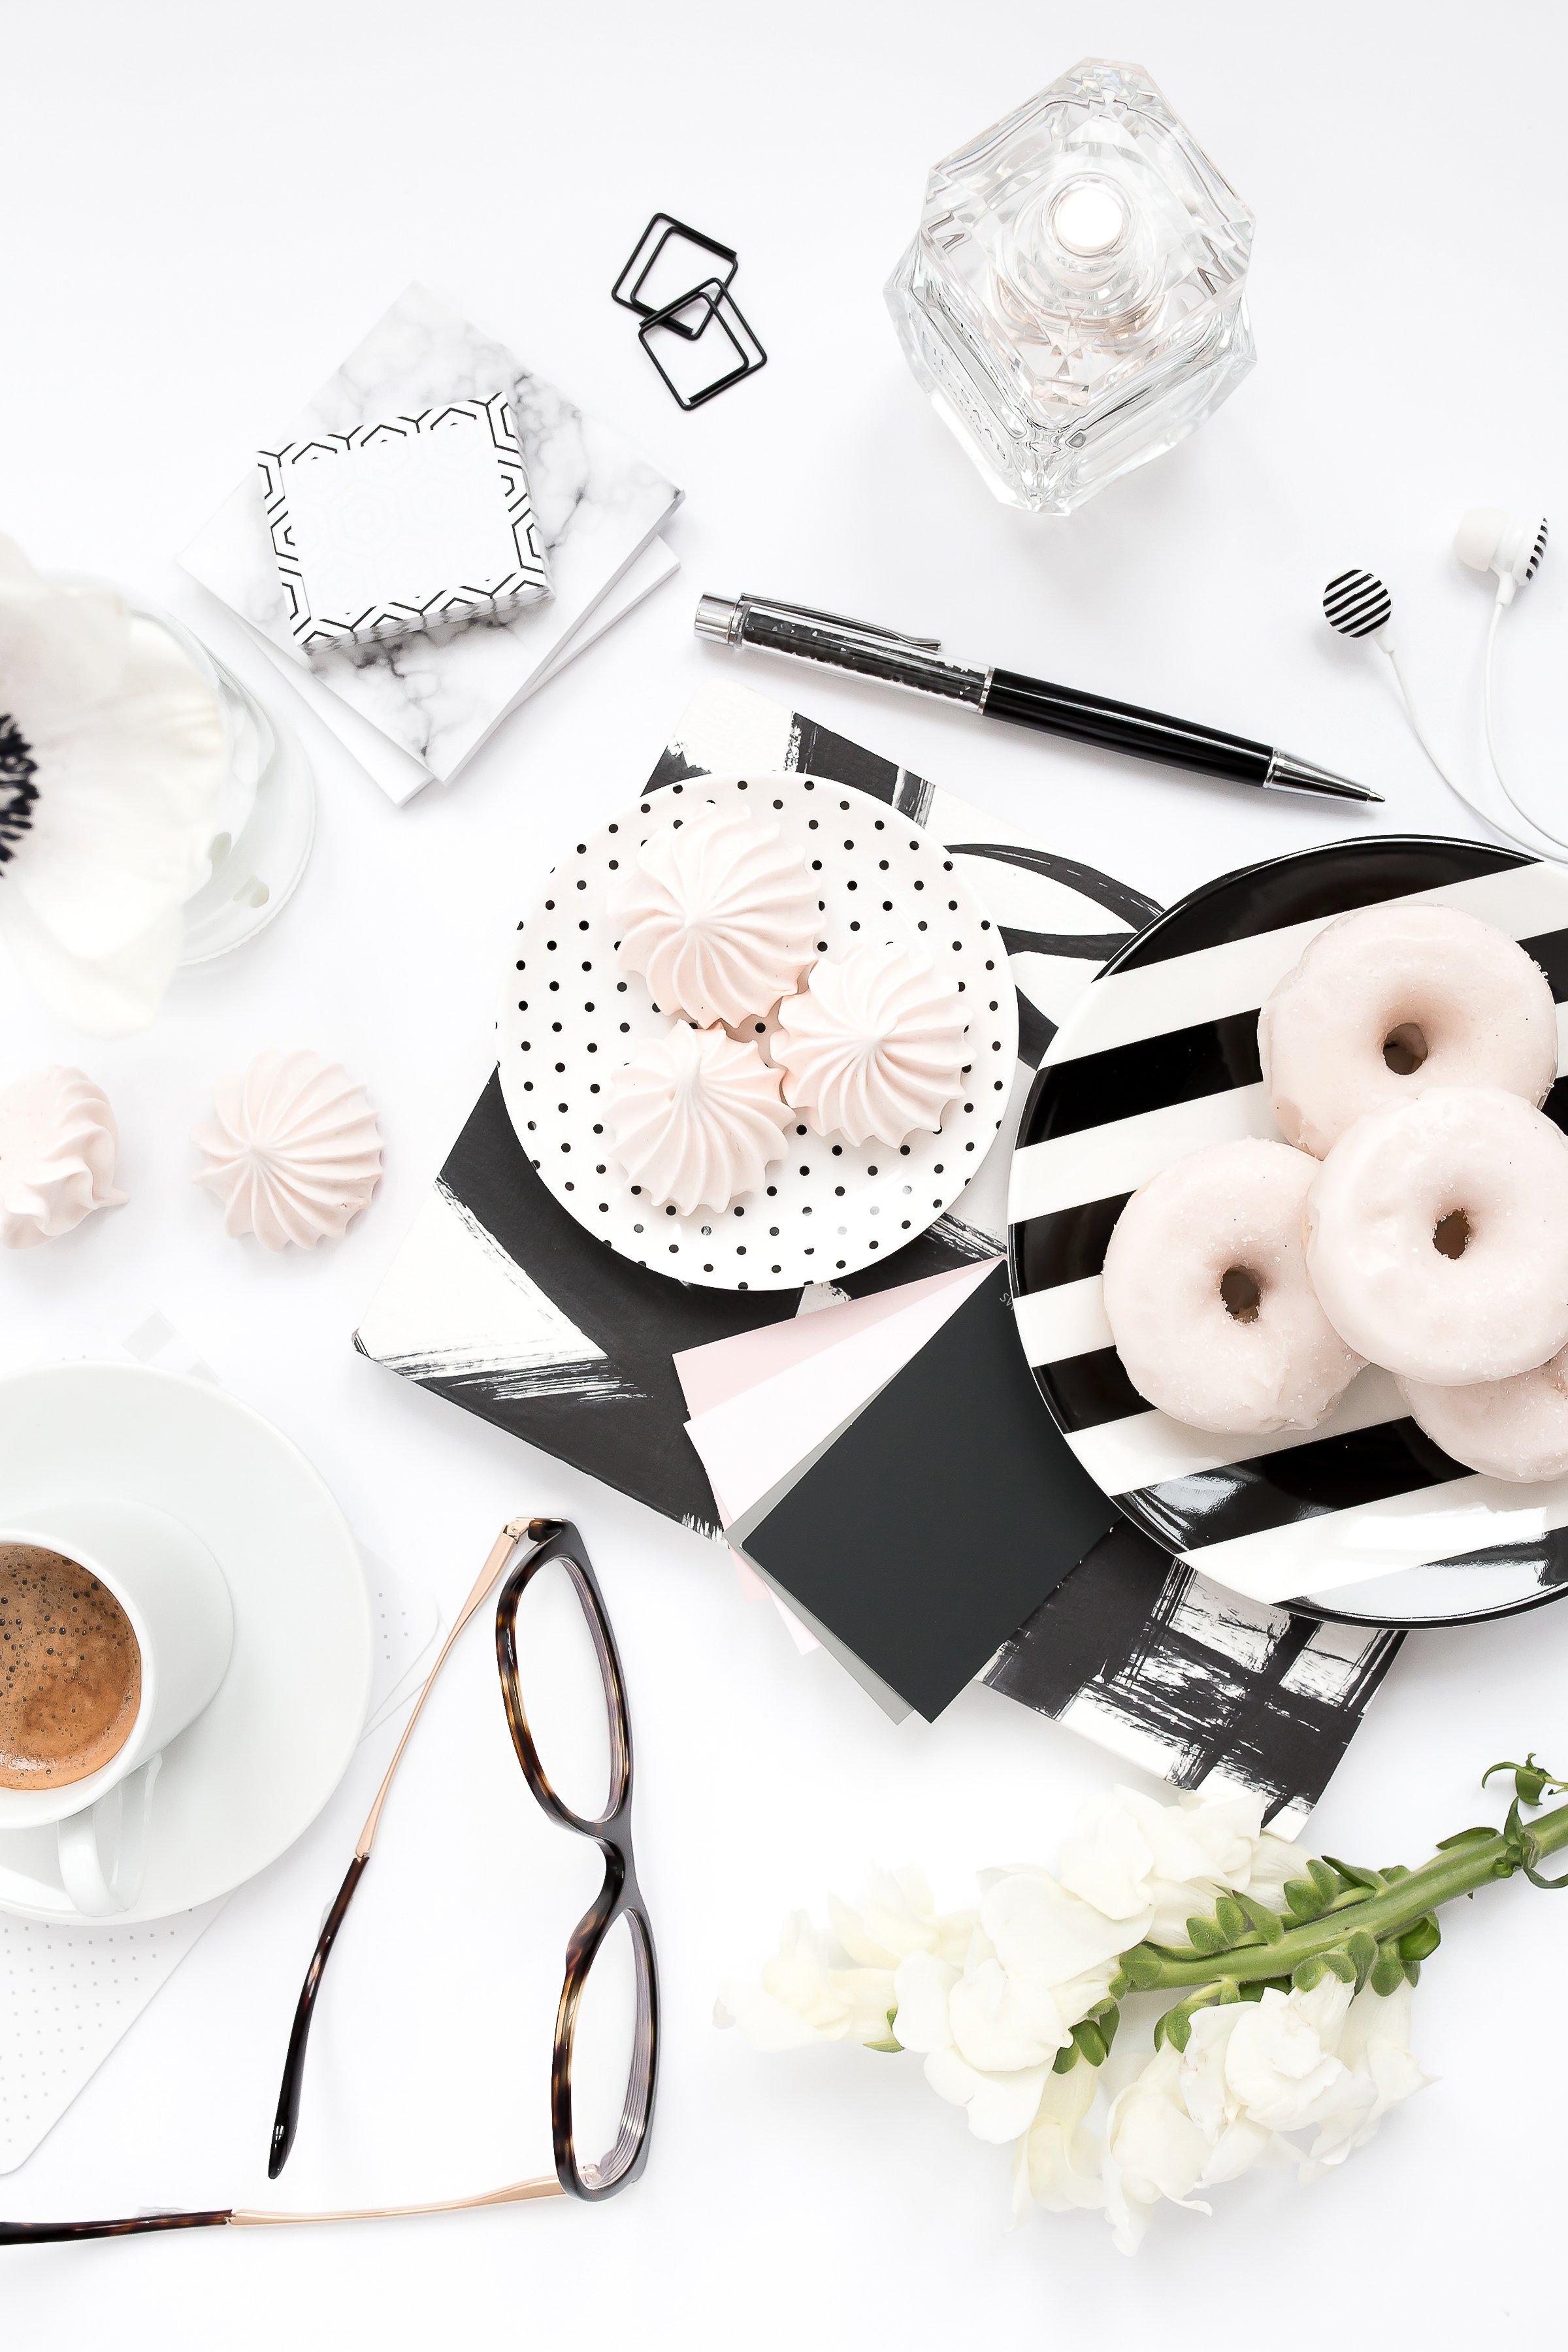 Coffee, flowers, donuts, and perfume flatlay.